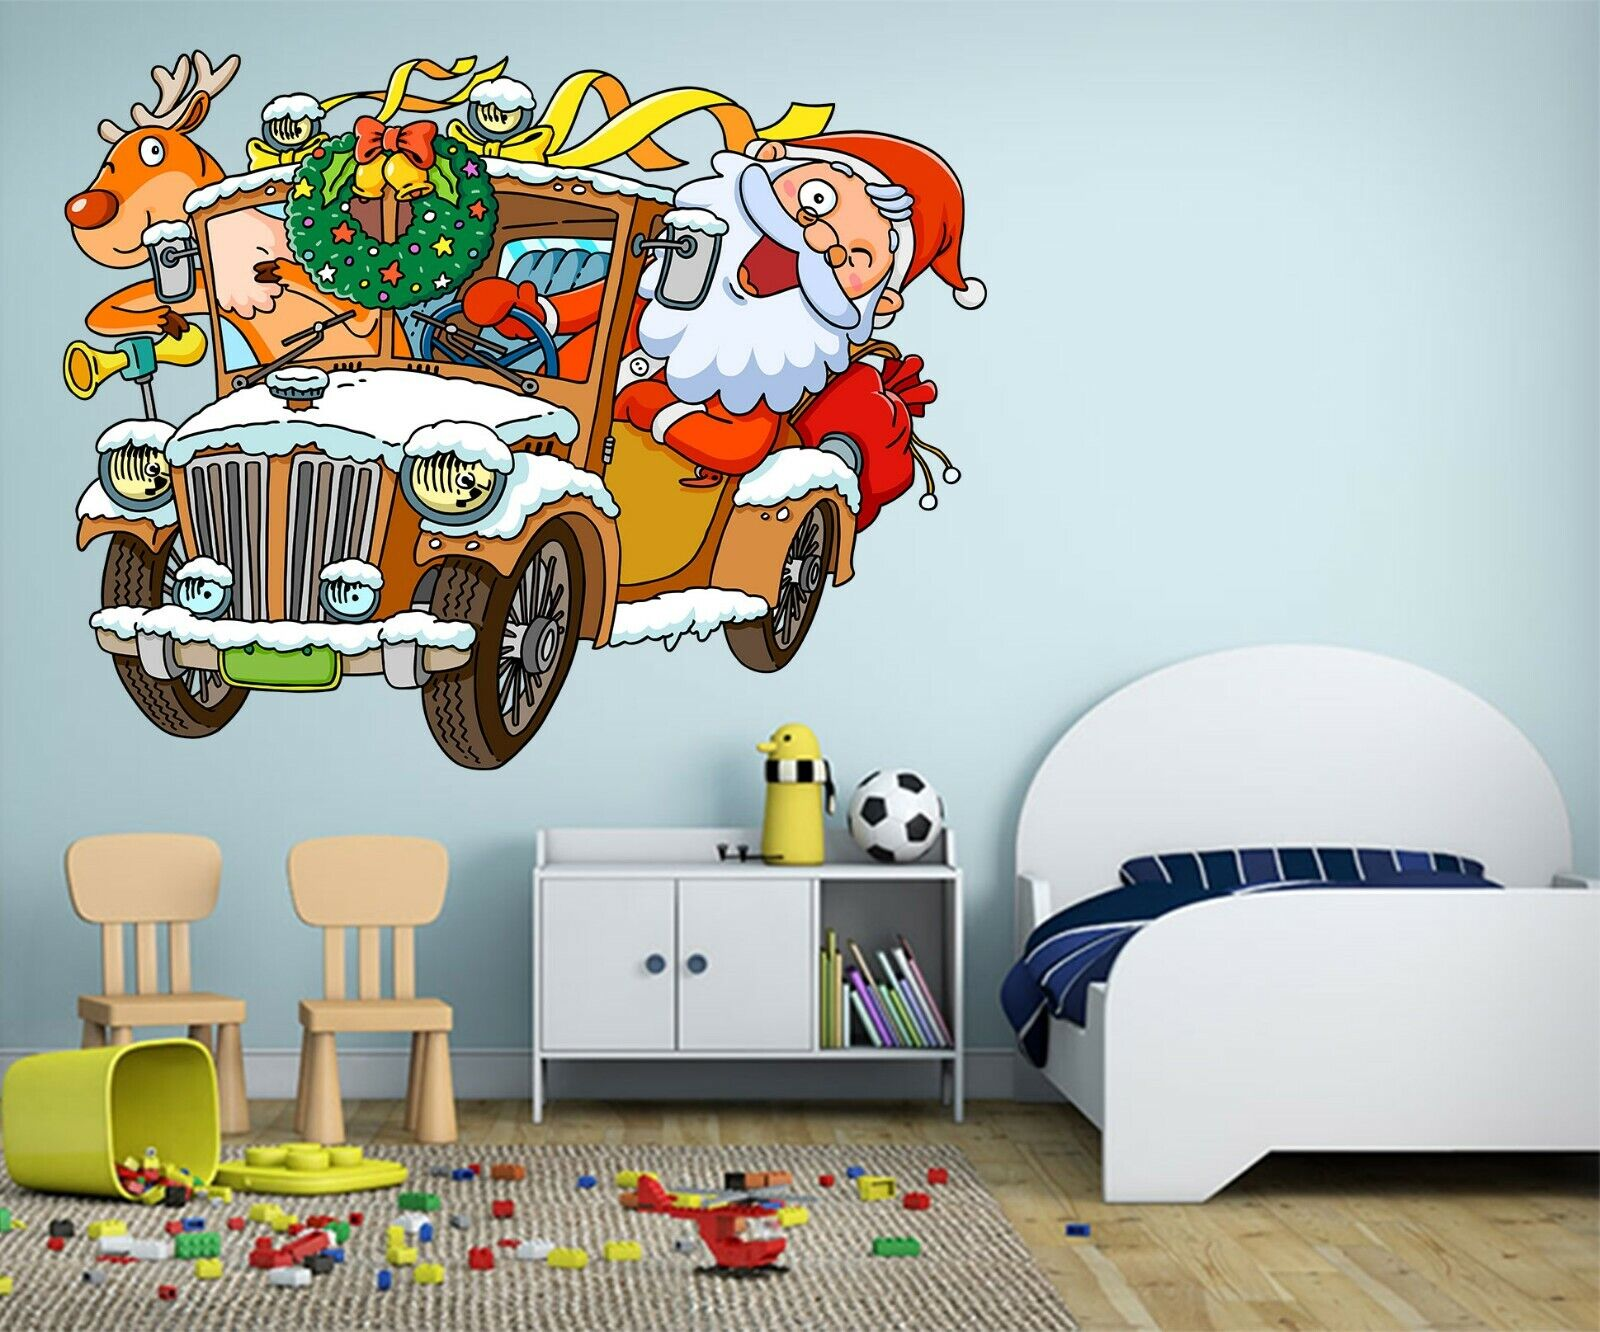 3D Santa Claus N522 Christmas Wallpaper Murals Wall Print Decal Wall Sticker Am